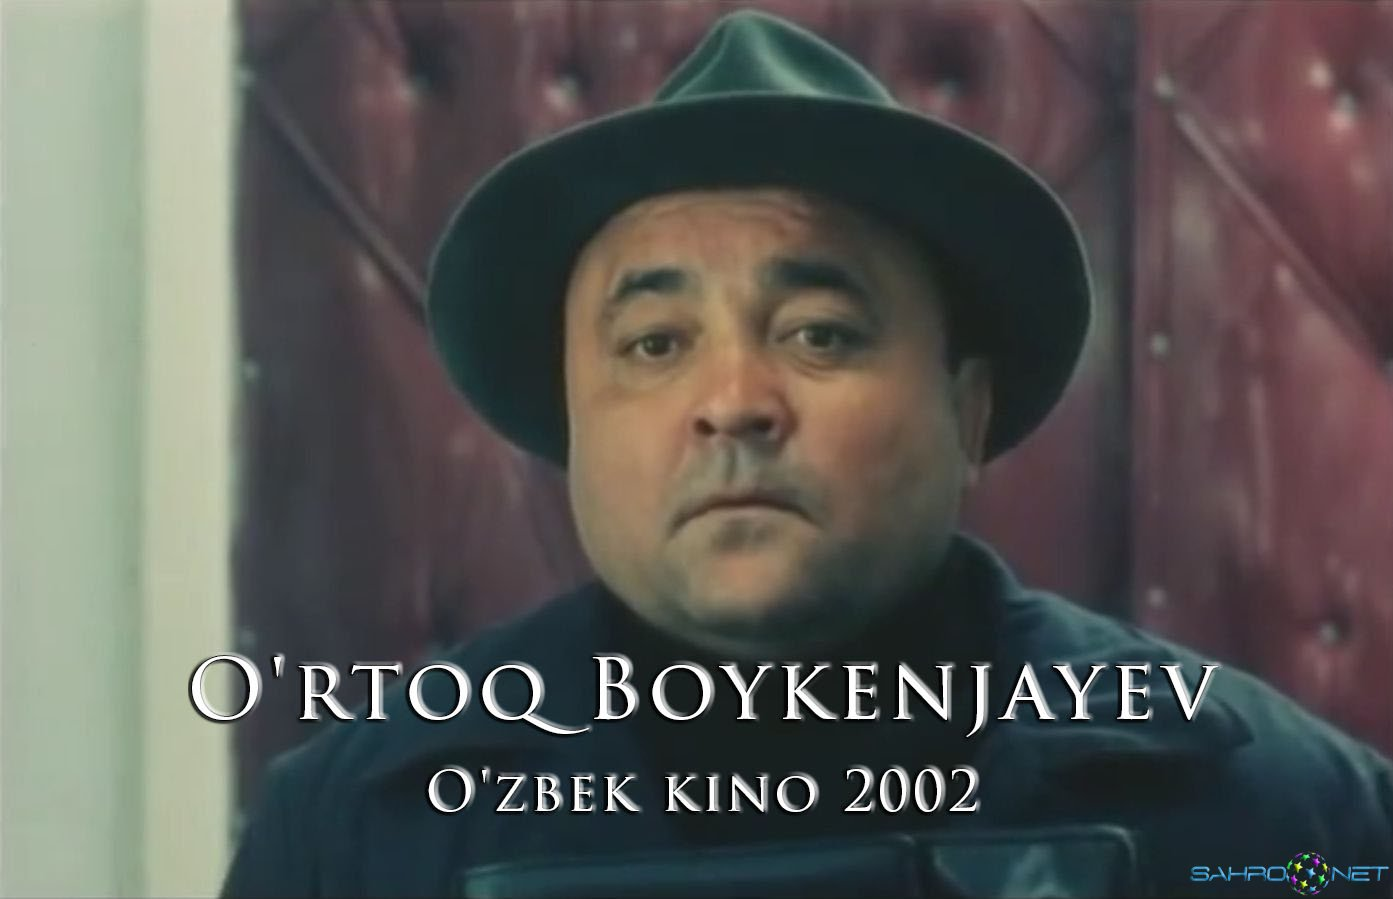 O'rtoq Boykenjayev / Товарищ Бойкенжаев - O'zbek Kino Film